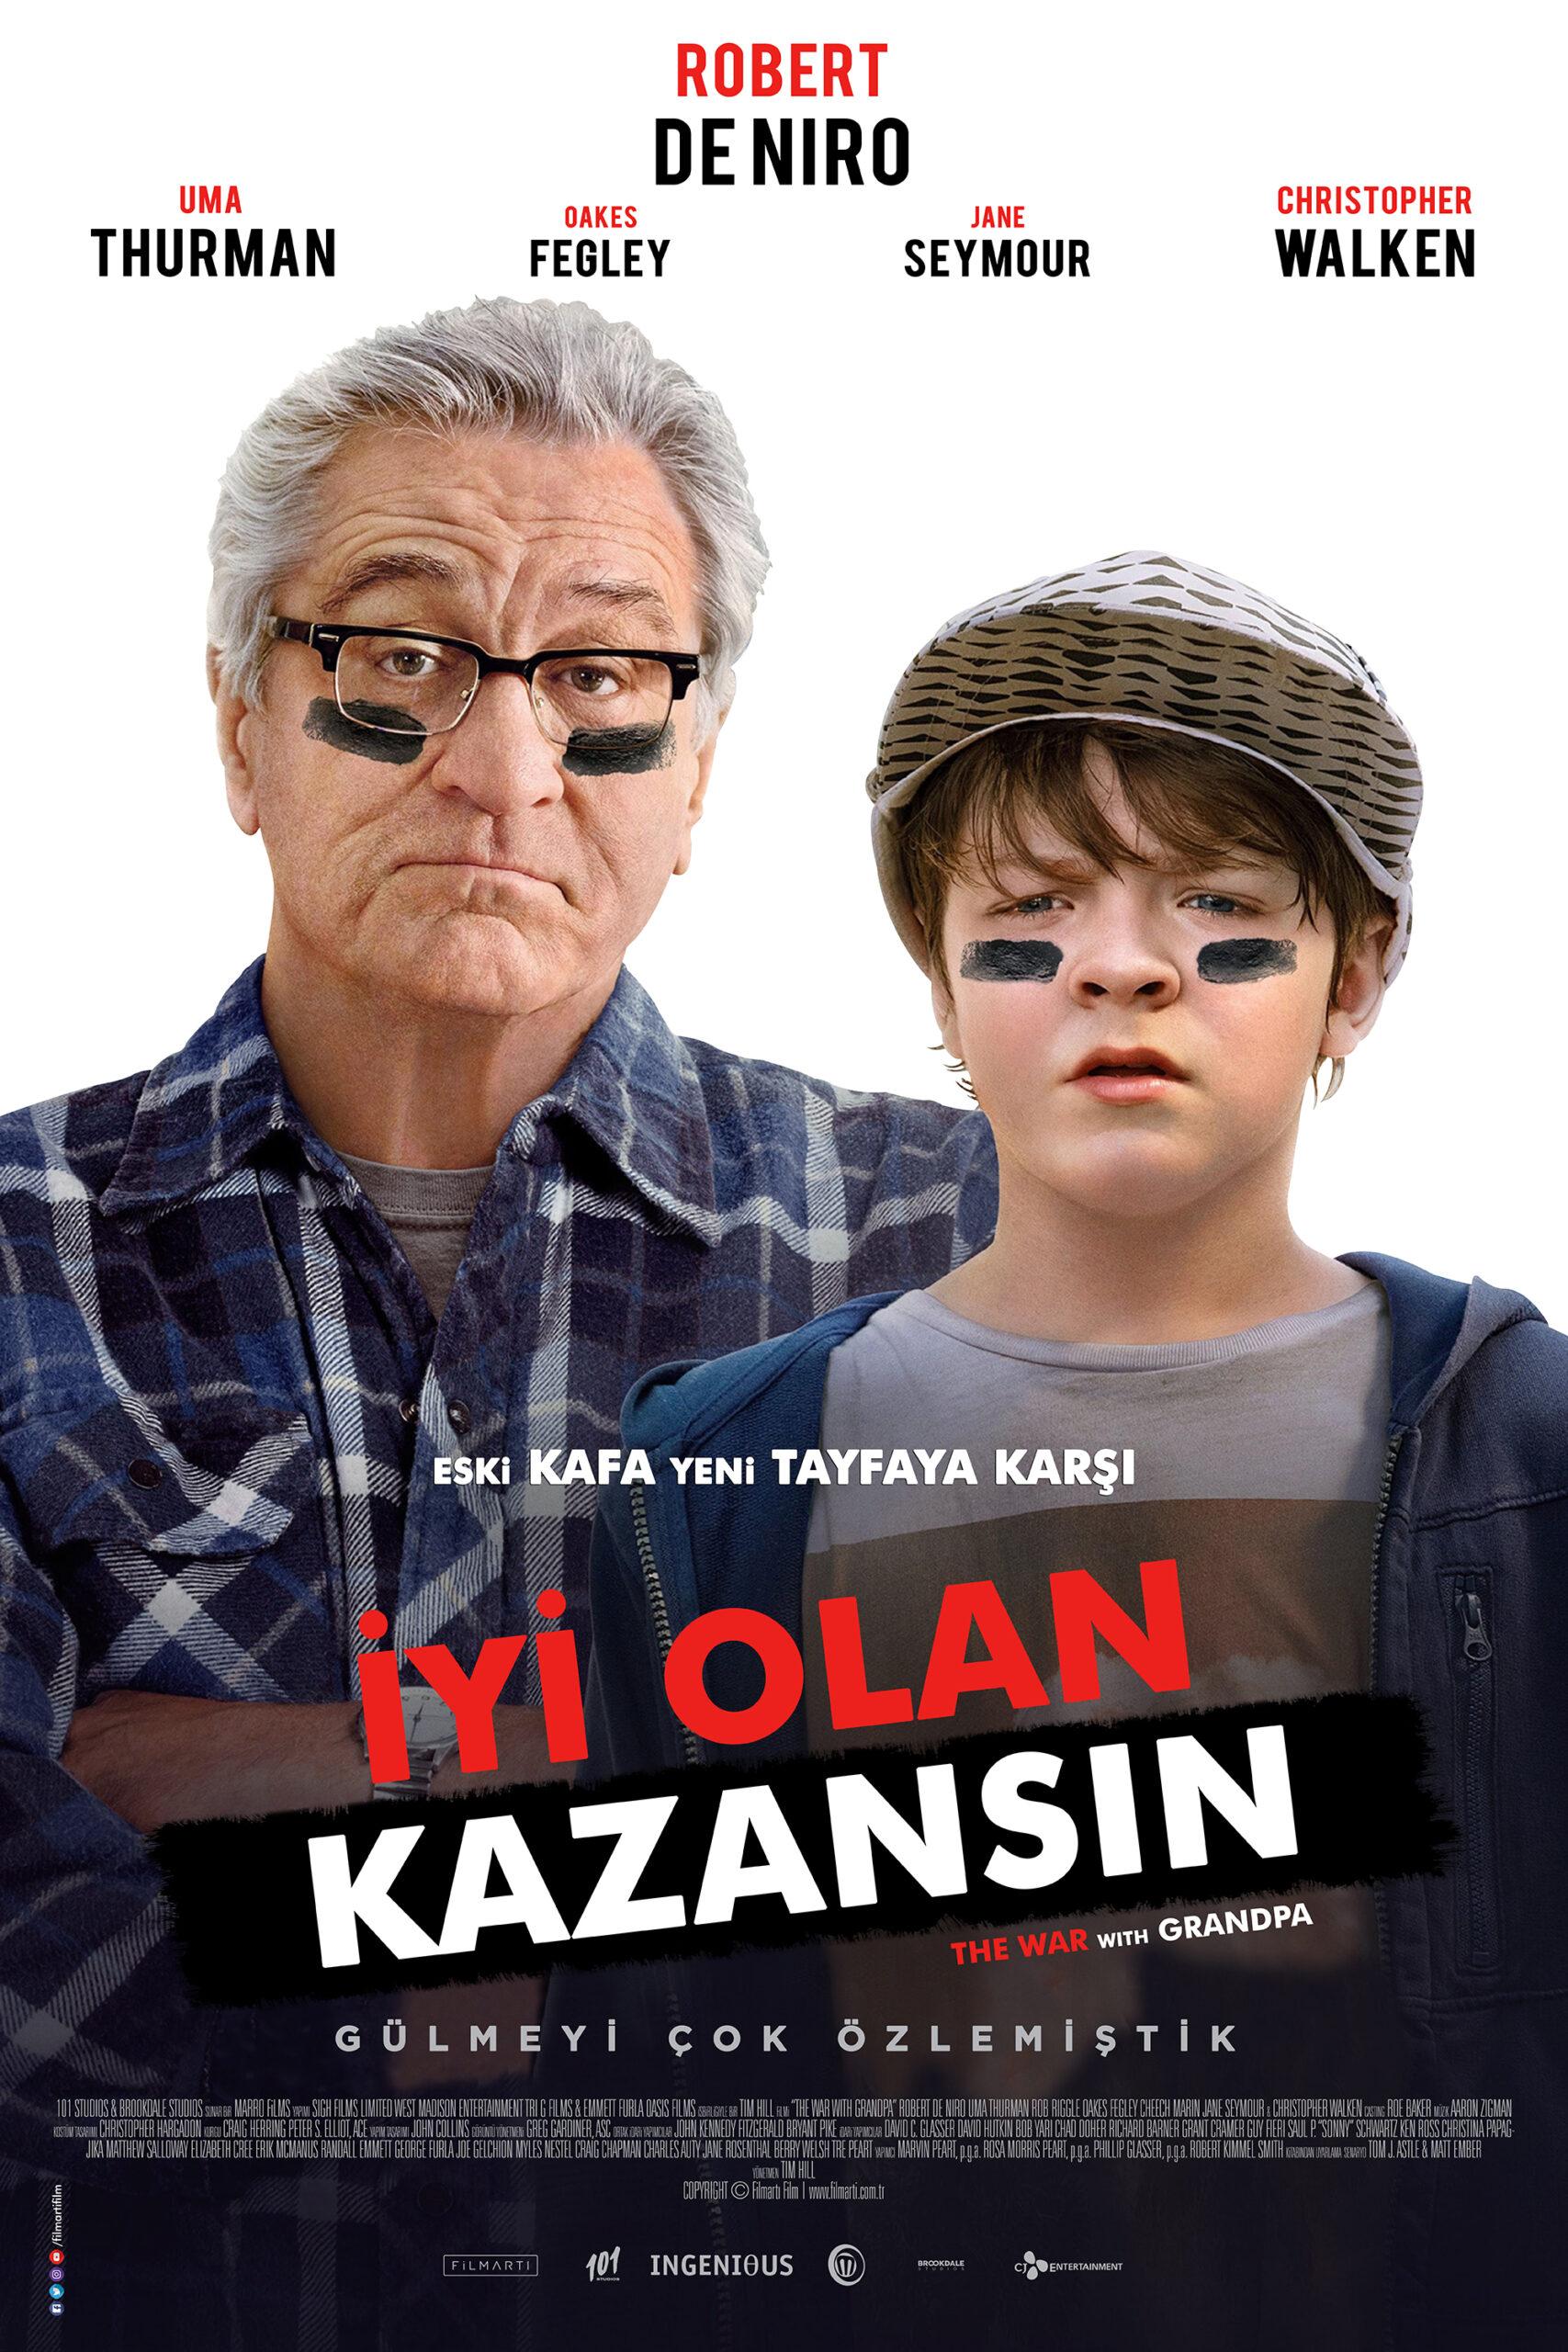 (Turkish) THE WAR WITH GRANDPA